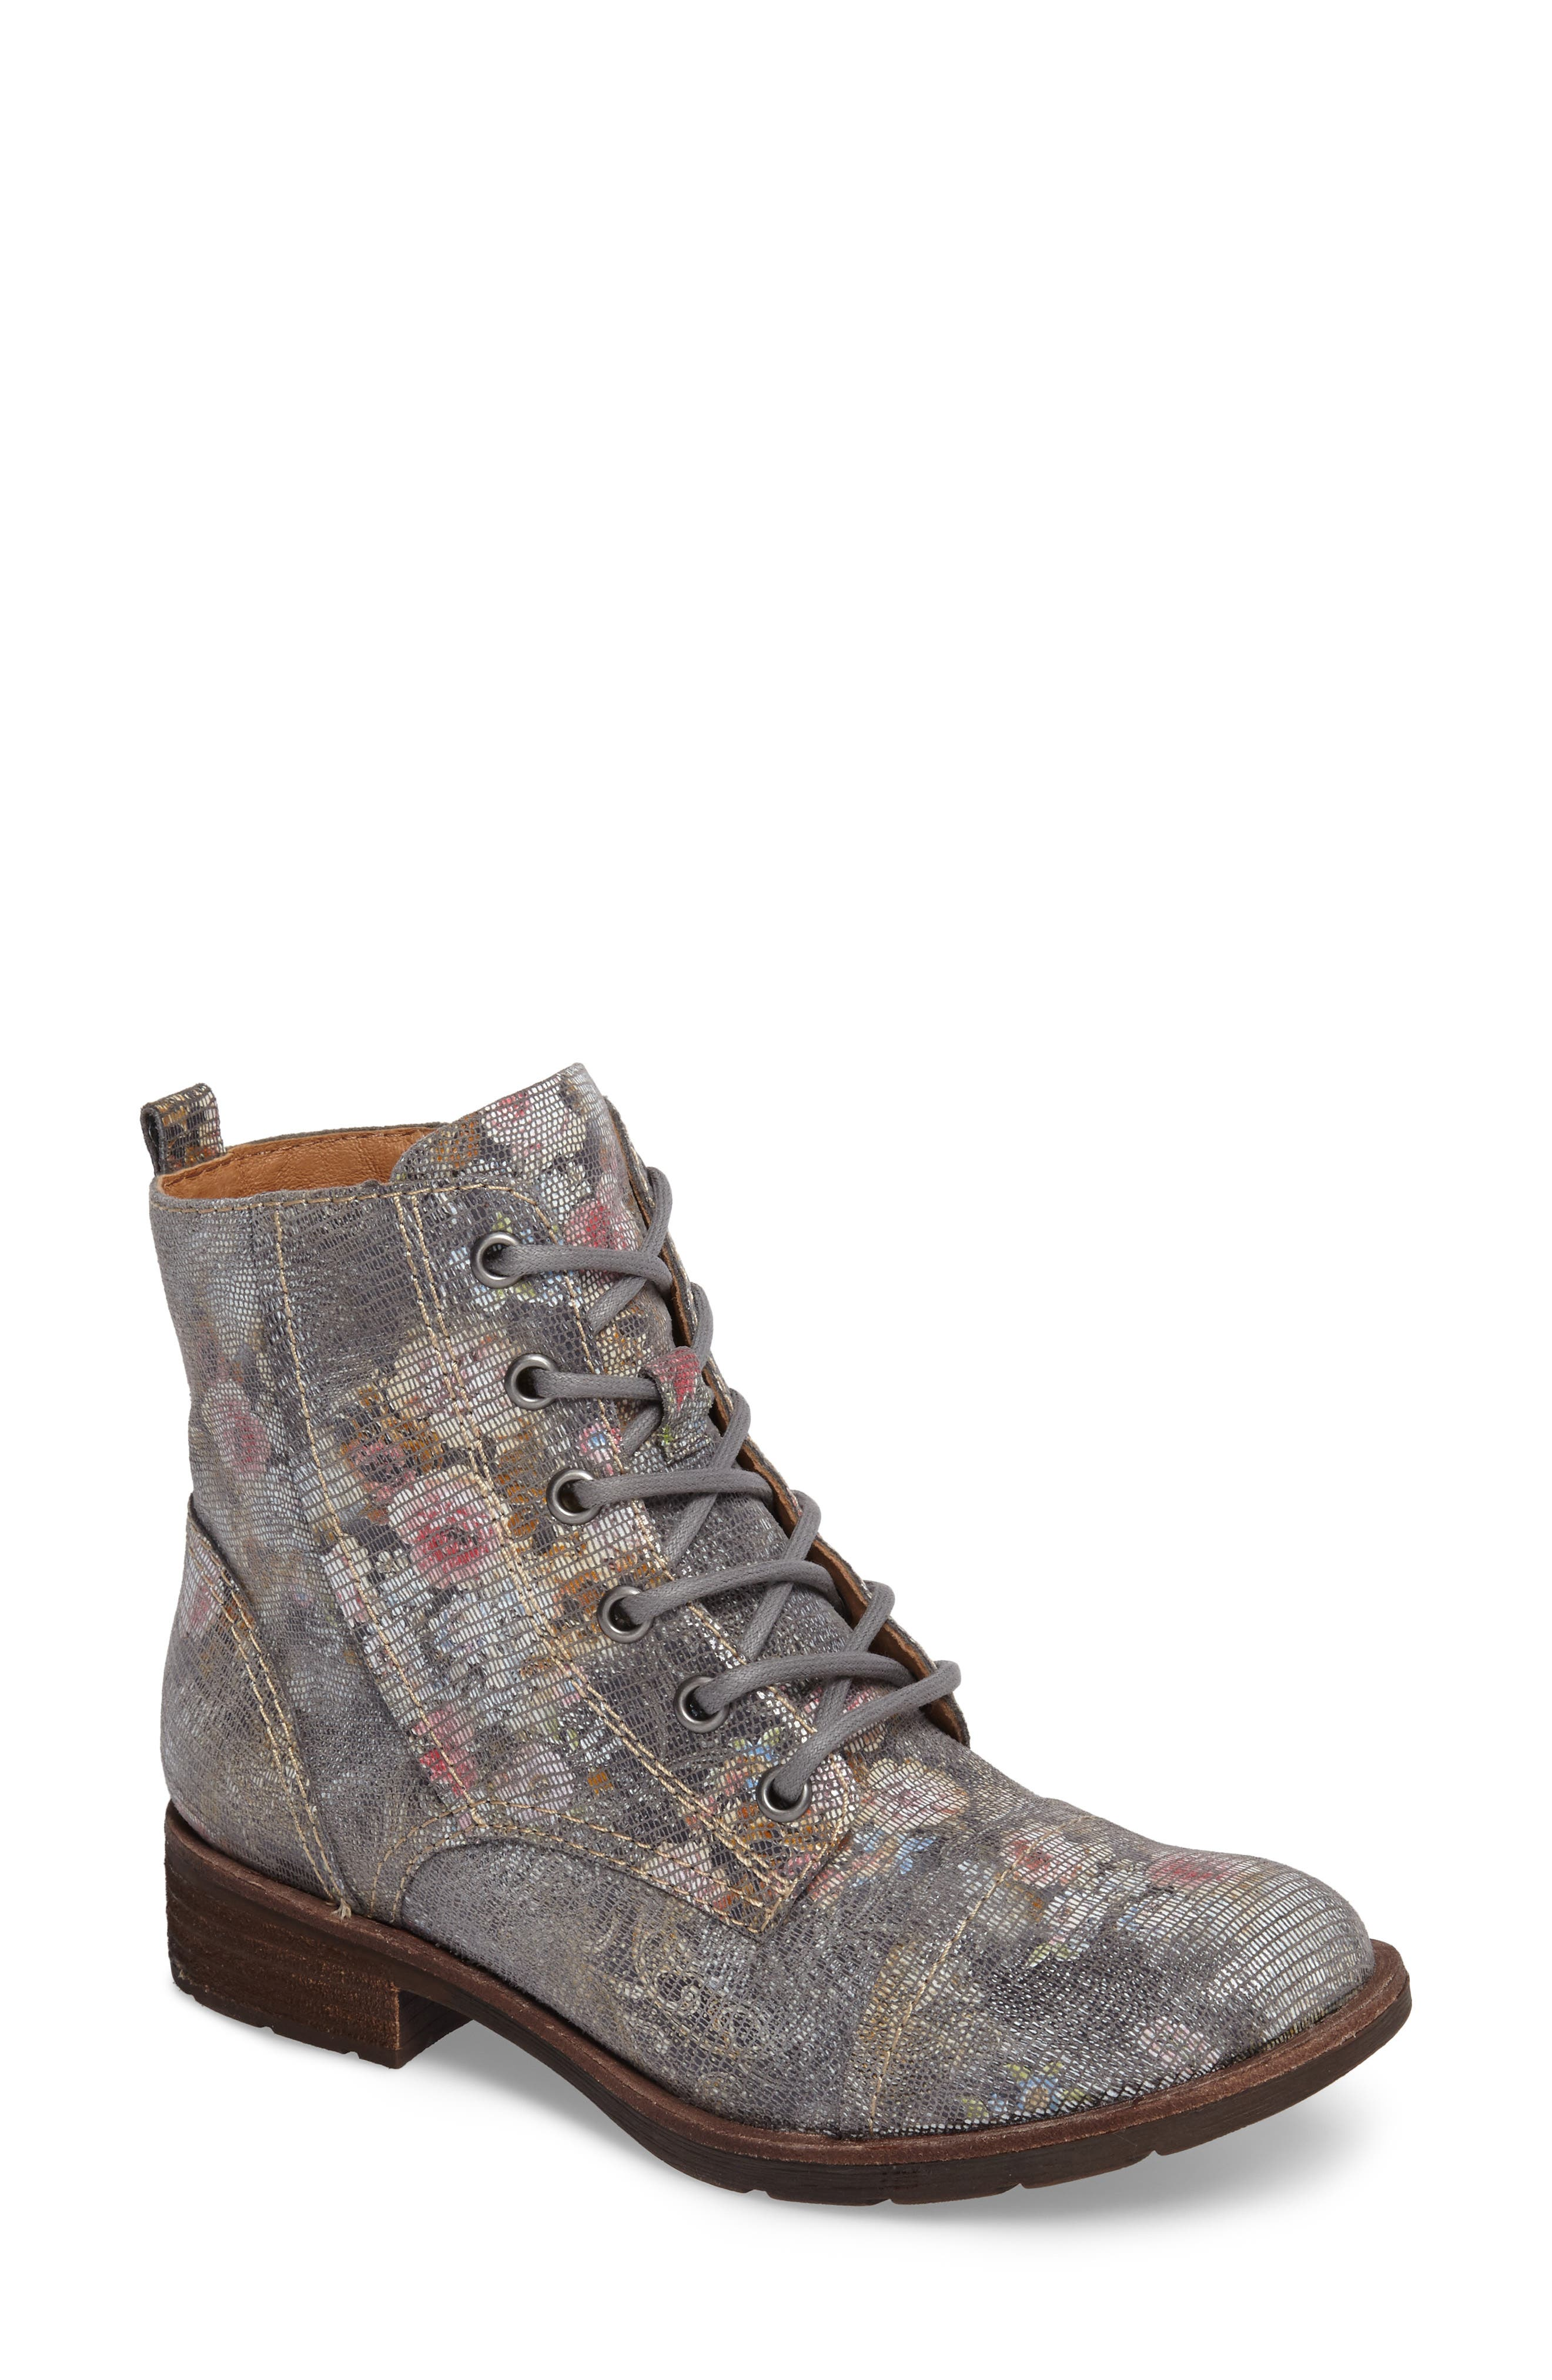 Belton Cap Toe Combat Boot,                         Main,                         color, Grey Leather